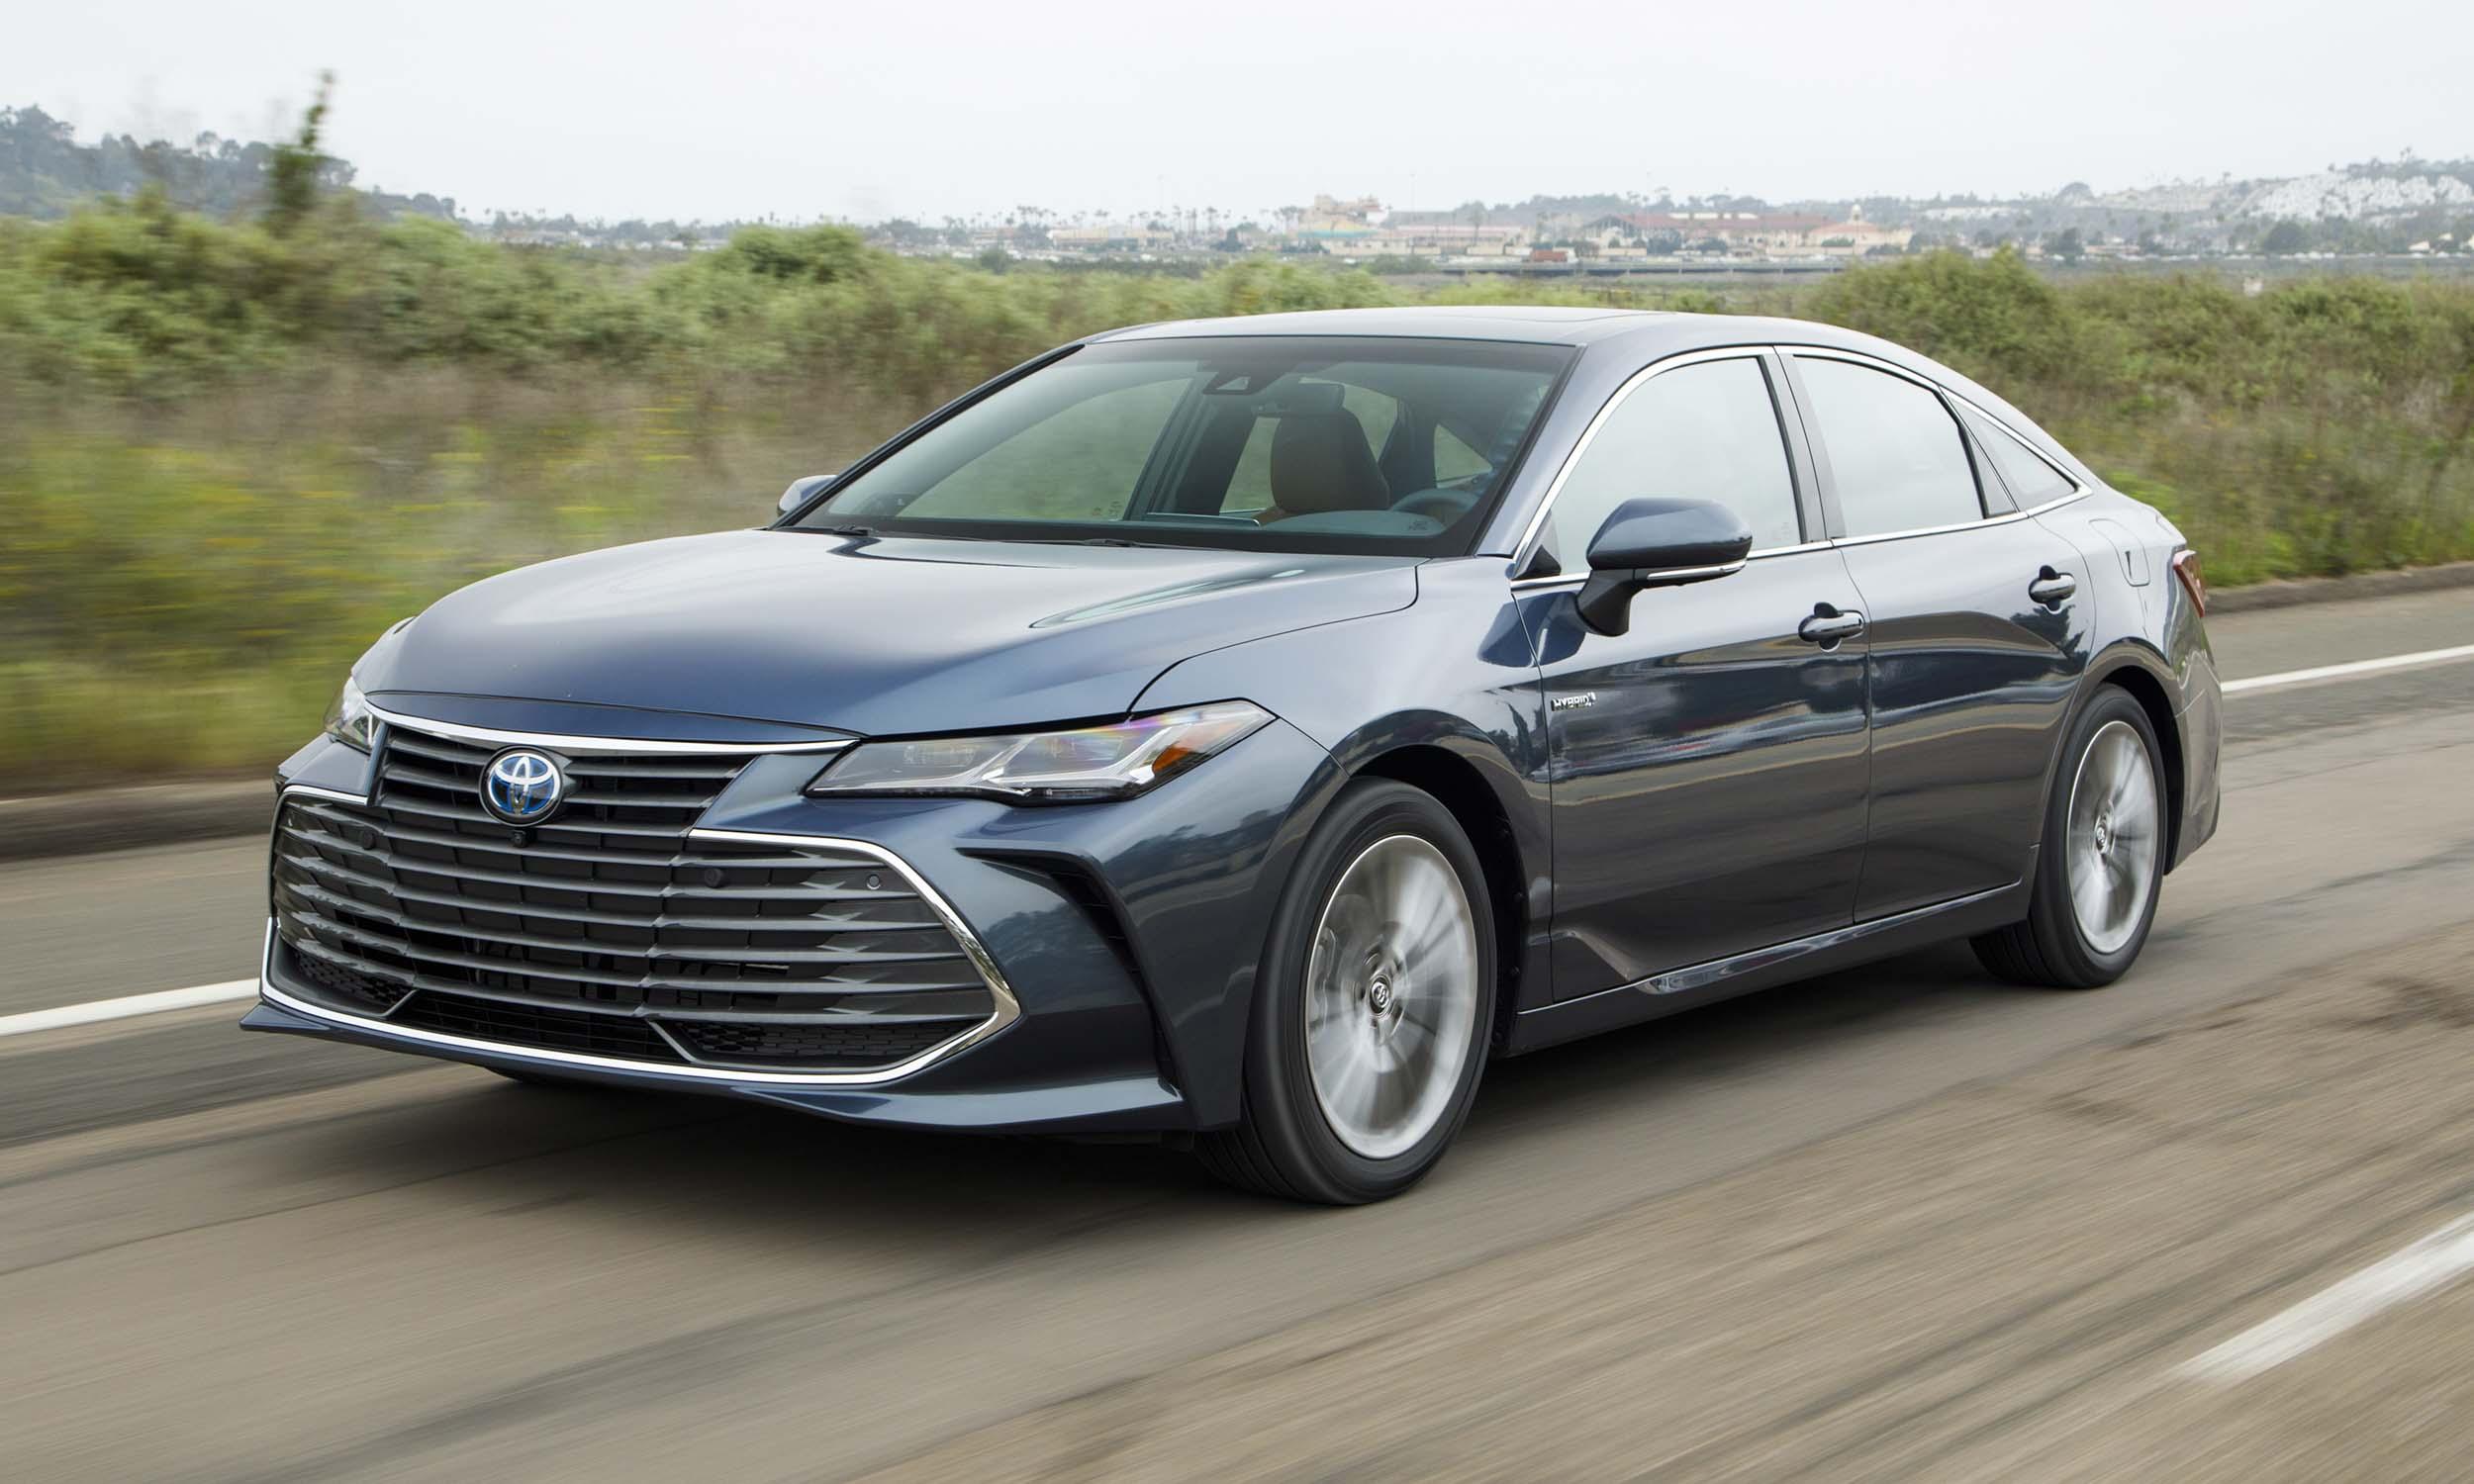 © Toyota Motor Sales, U.S.A., Inc.